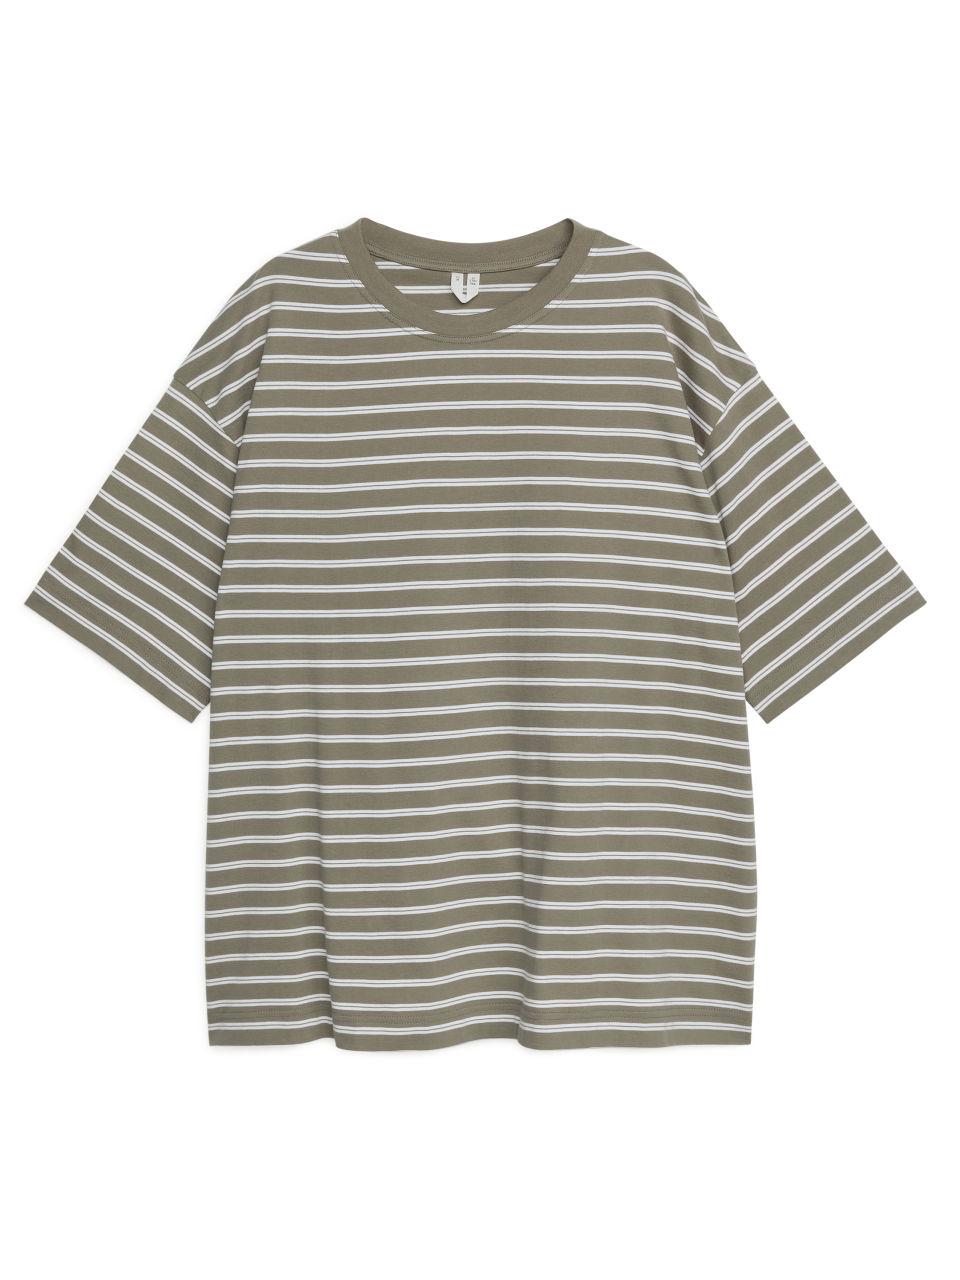 Oversized T-Shirt - Brown